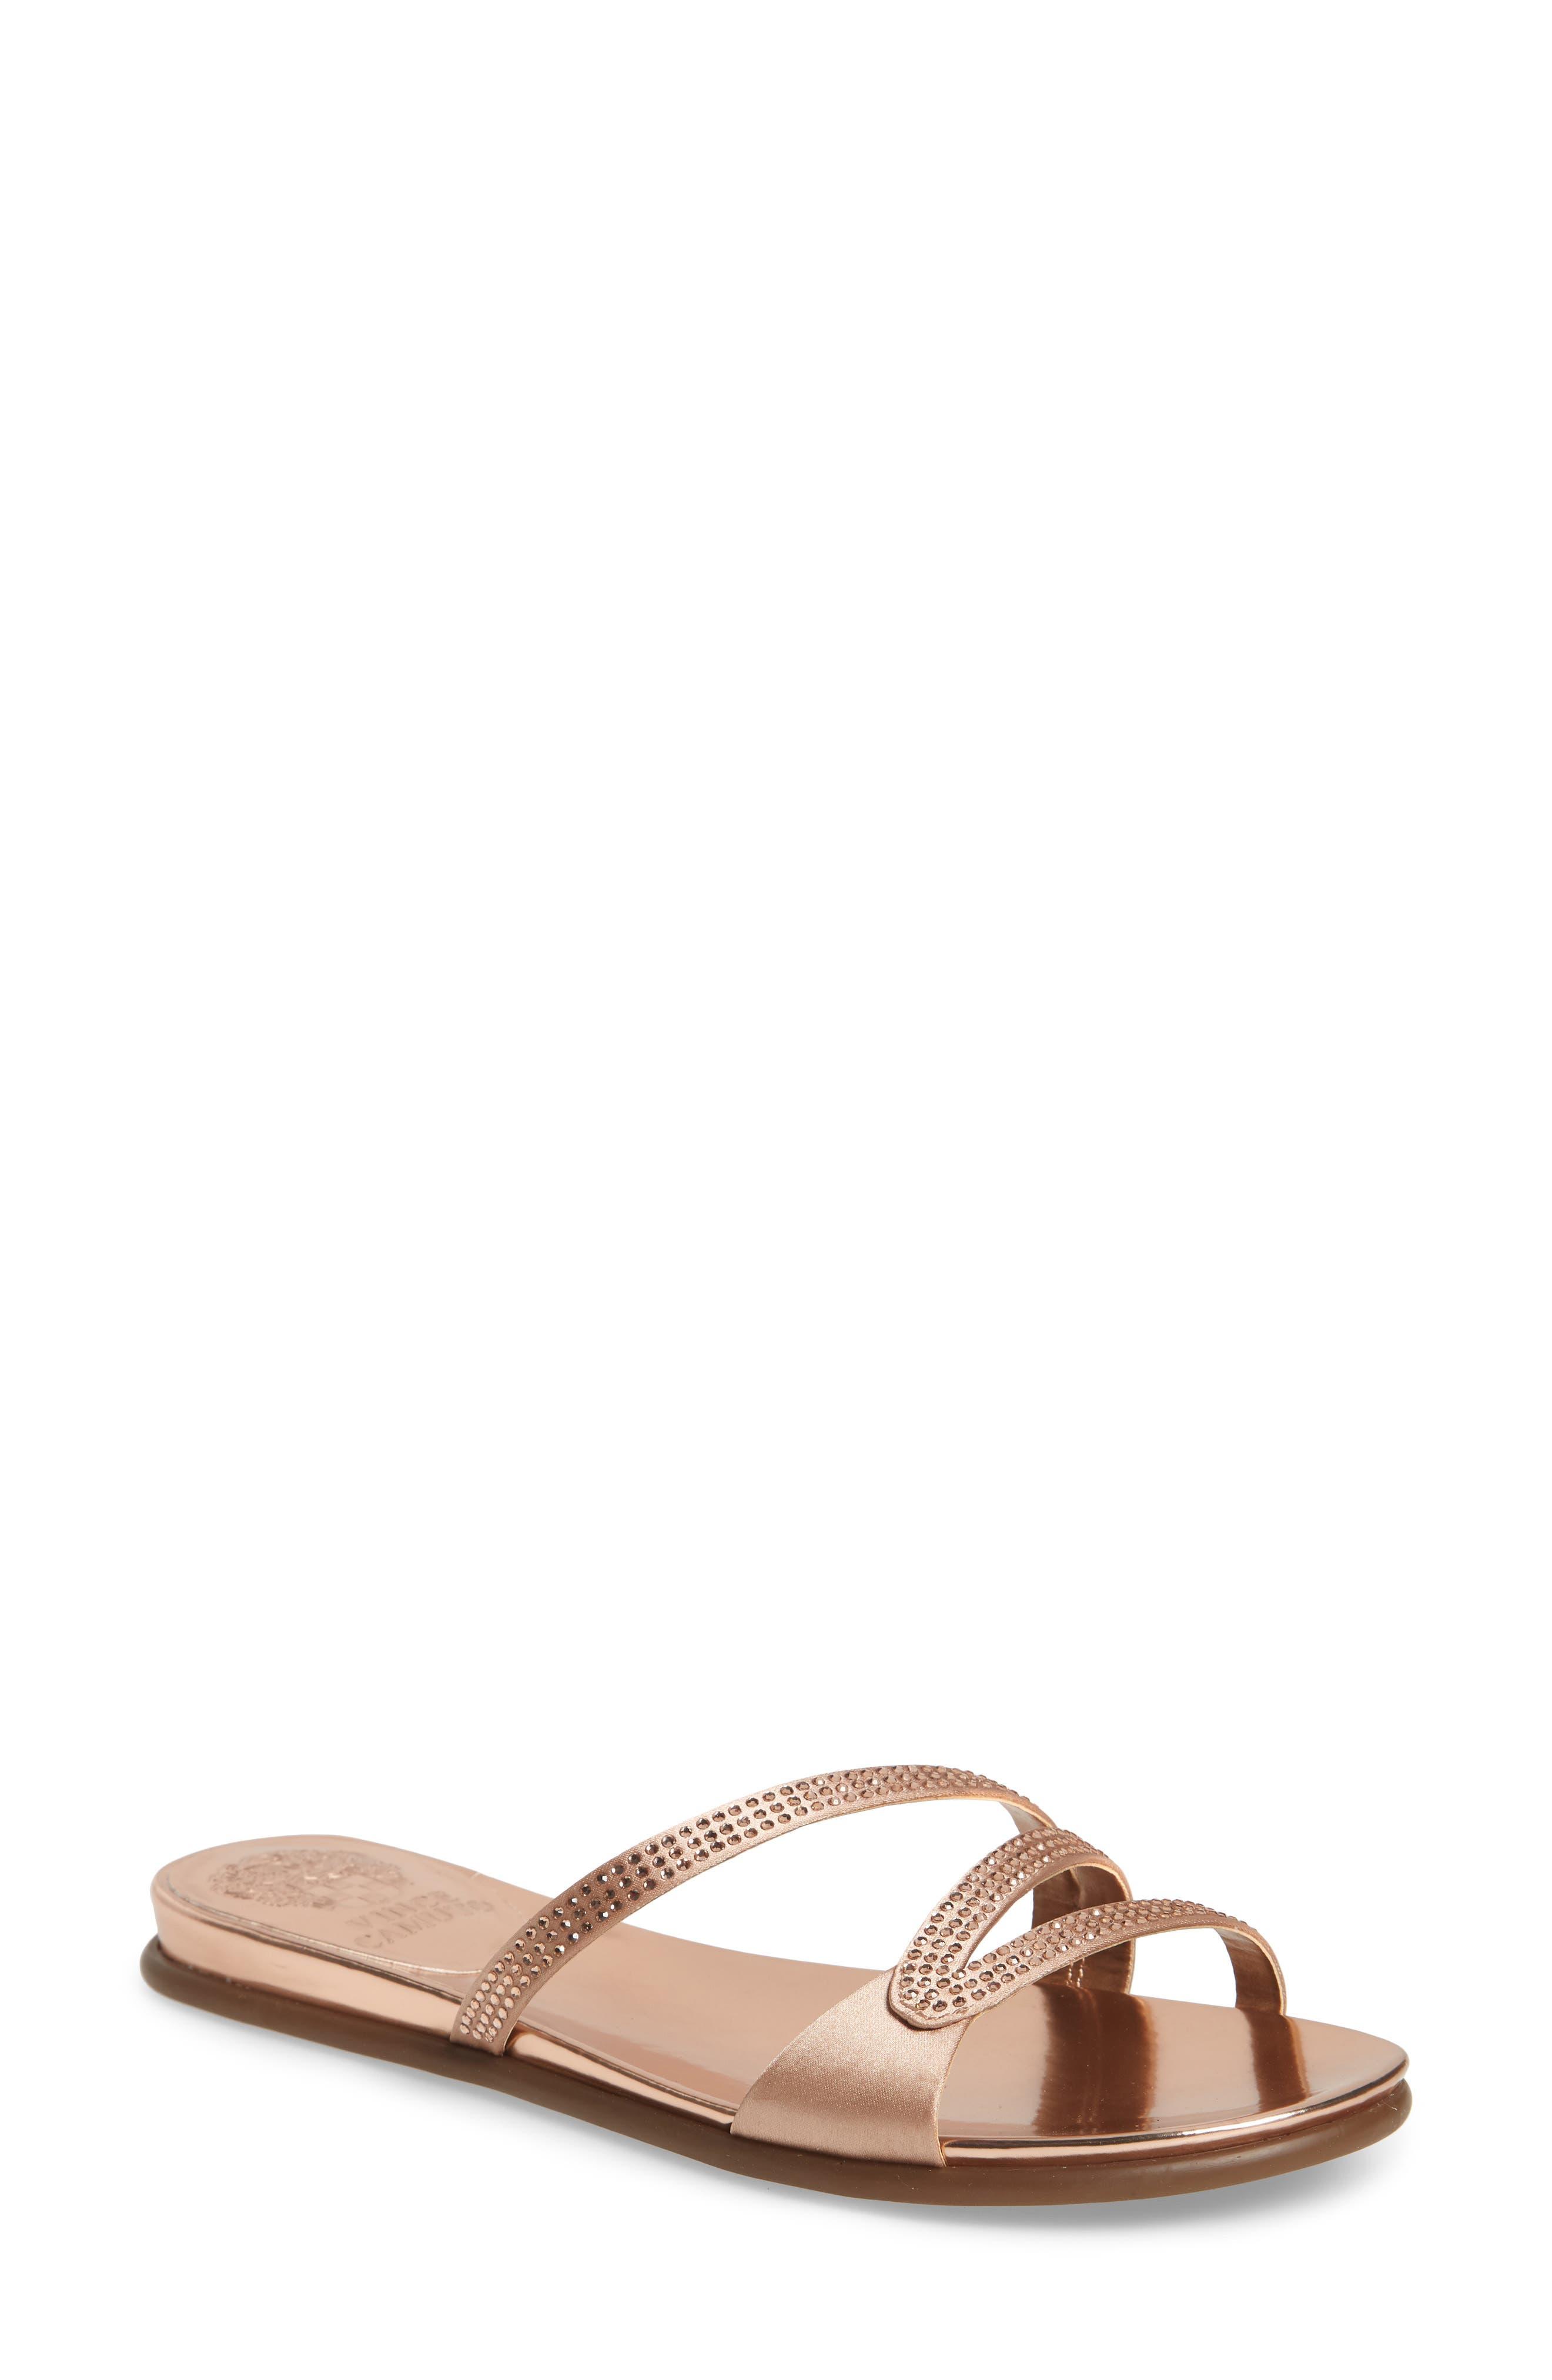 Elouisa Crystal Slide Sandal,                             Main thumbnail 1, color,                             Pink Bisque Satin